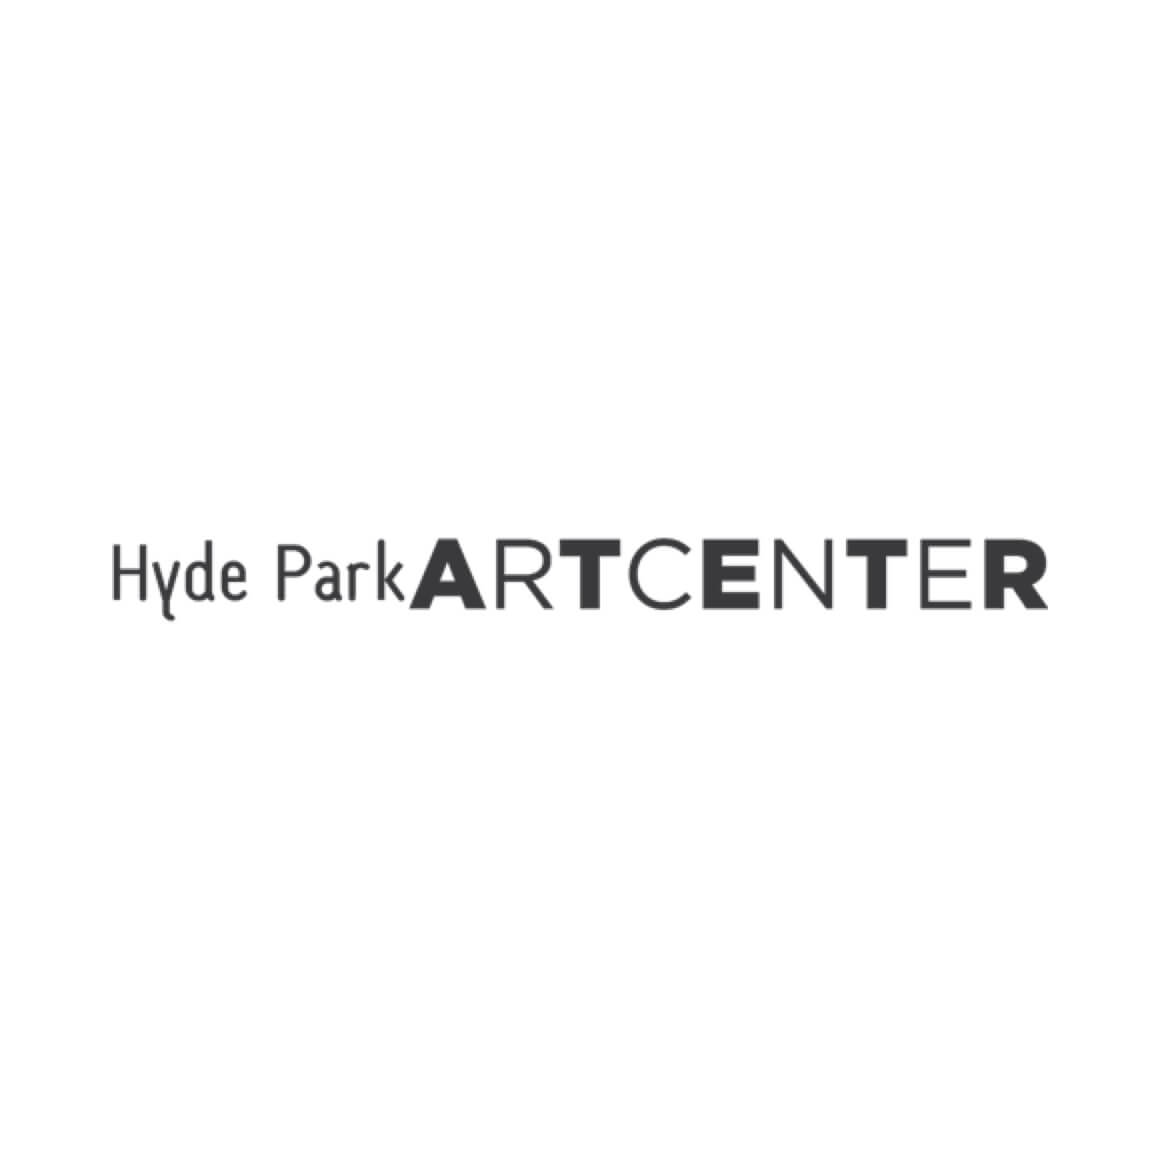 HYDE_PARK